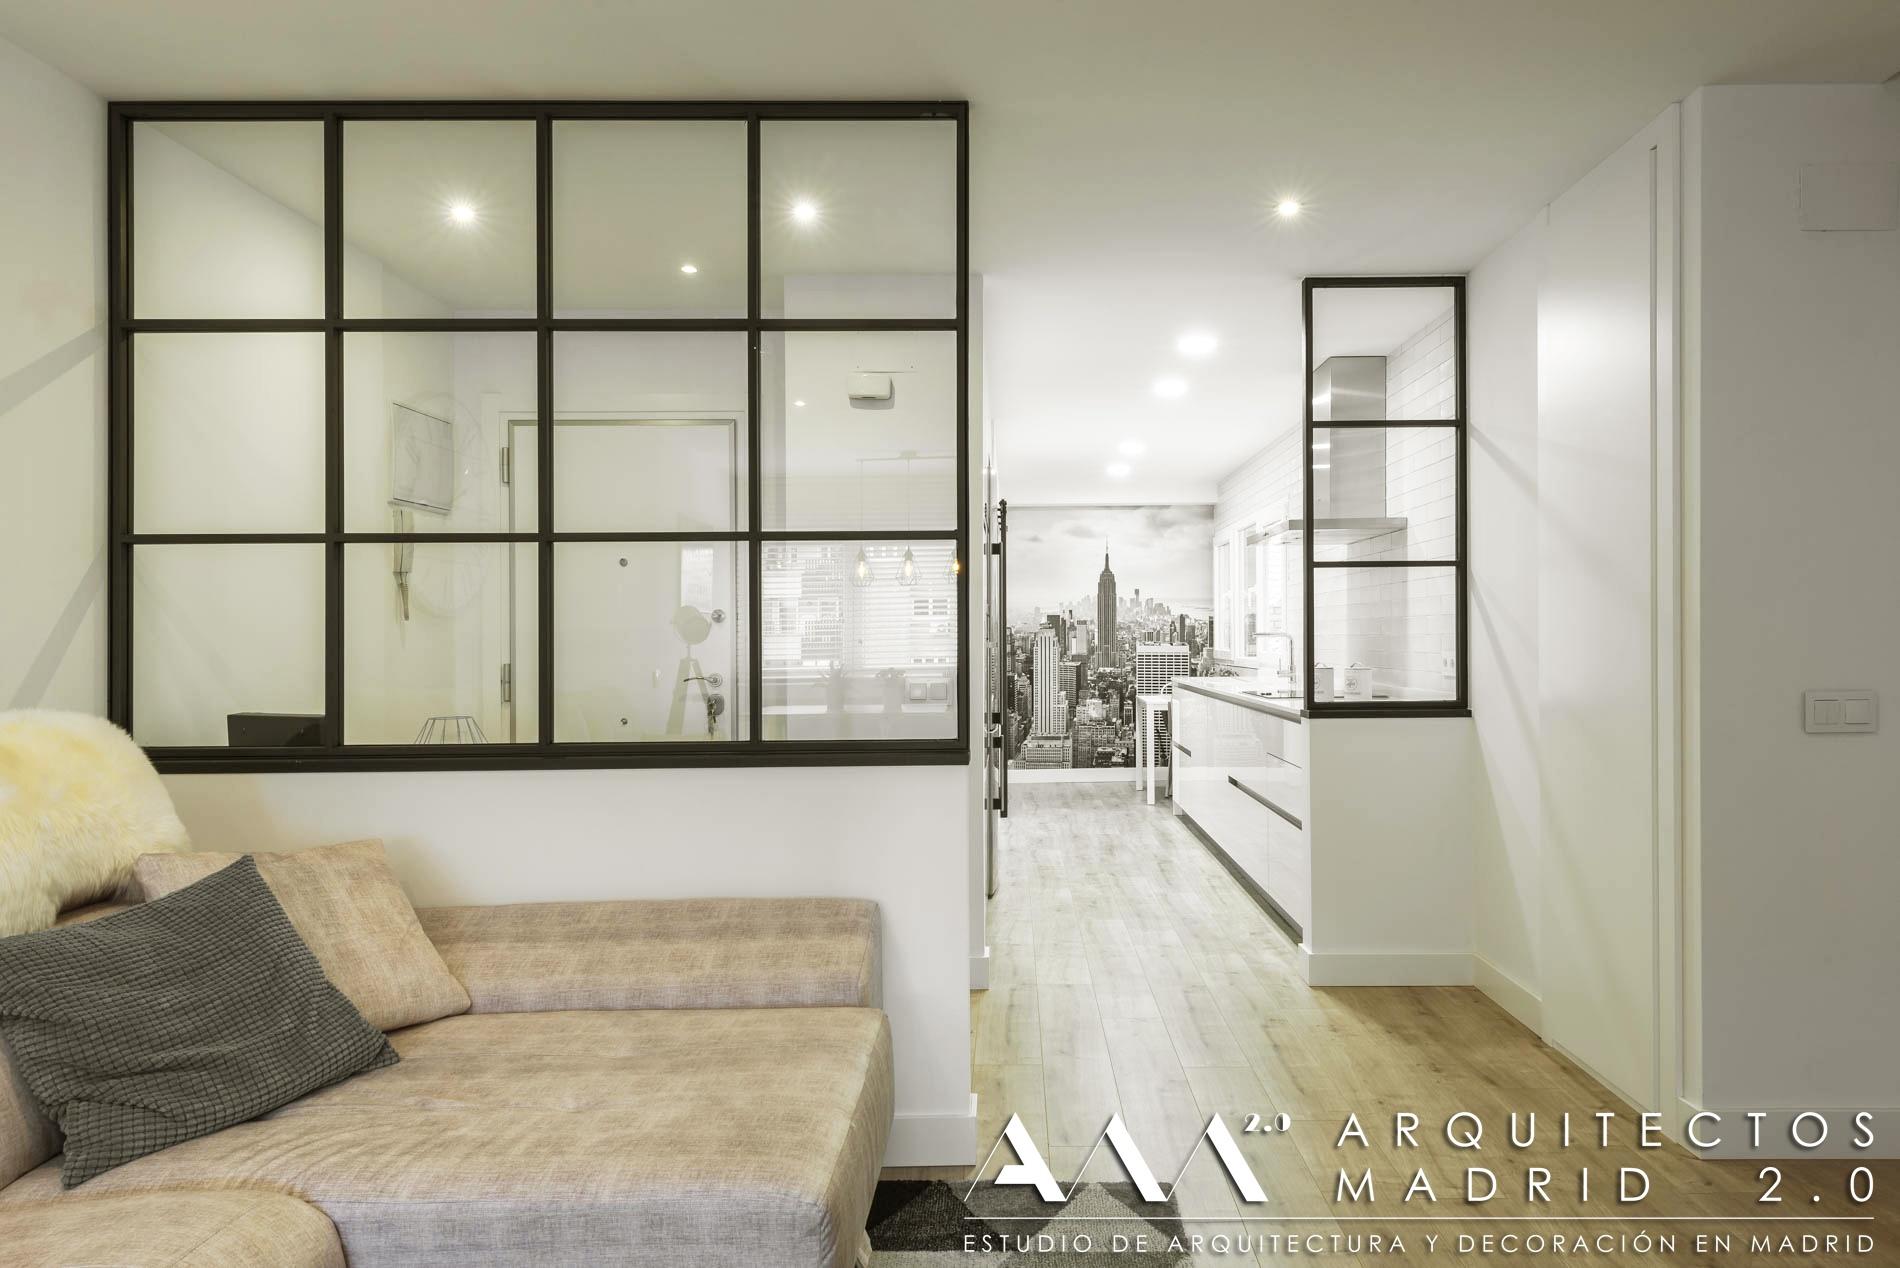 reforma-vivienda-housing-reform-architects-design-by-arquitectos-madrid-06